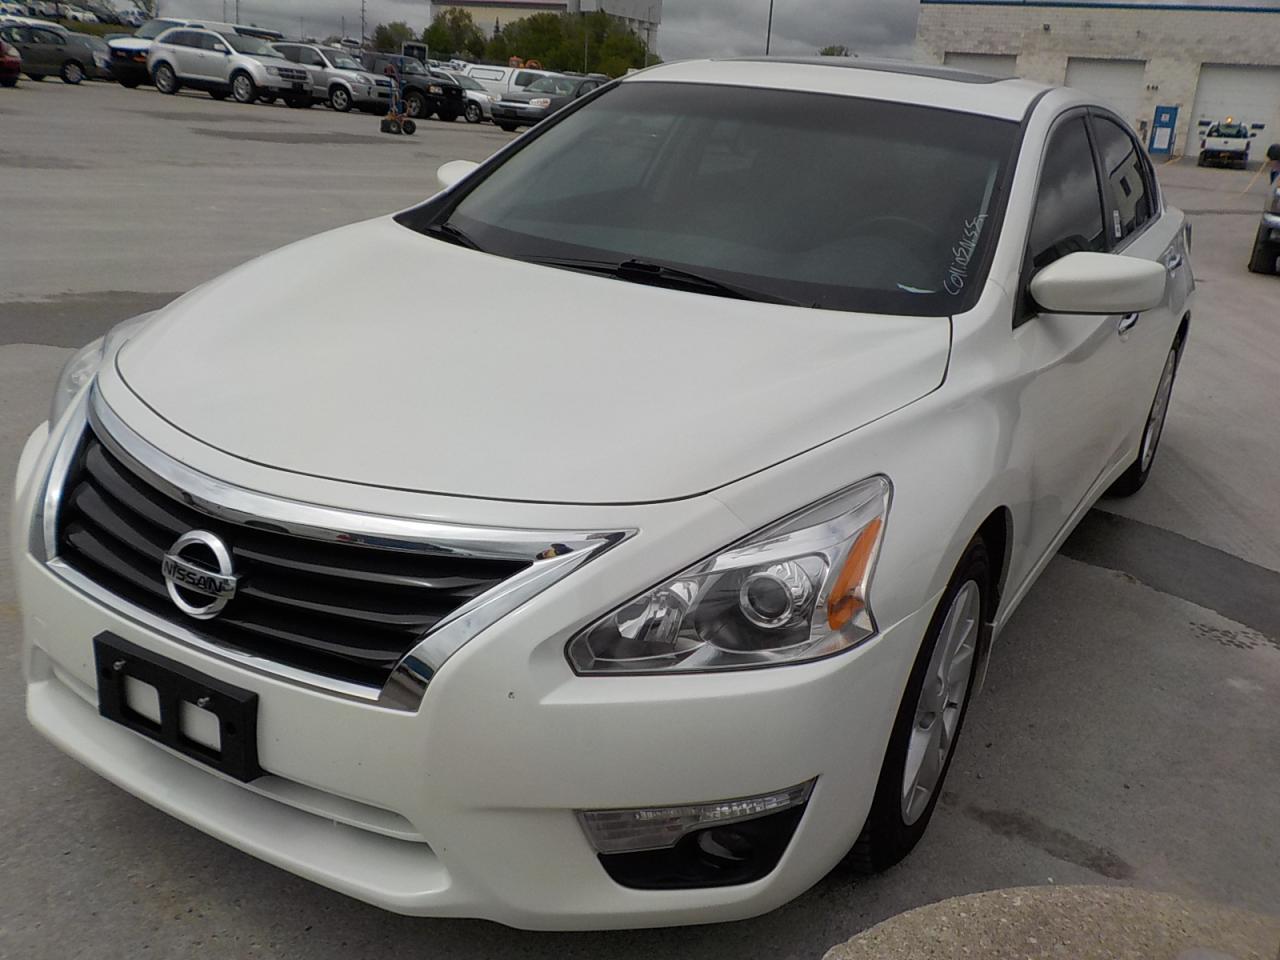 Photo of White 2015 Nissan ALTIMA SV